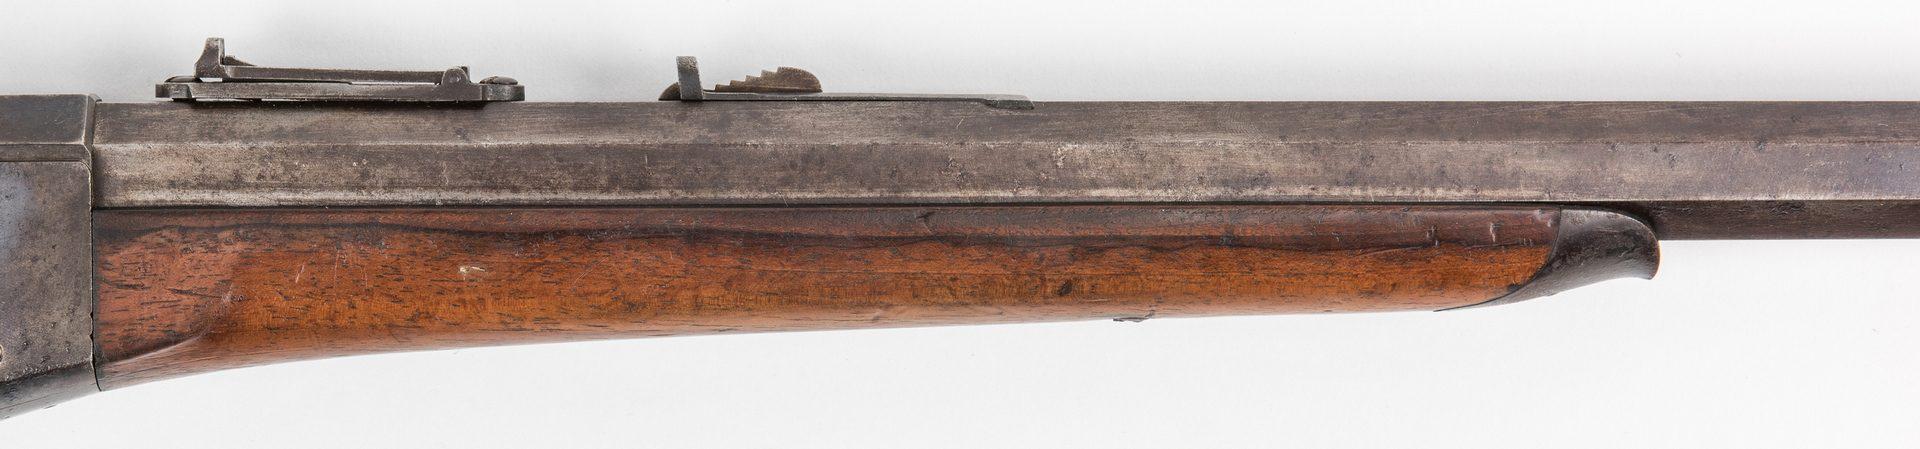 Lot 788: Remington Rolling Block Single Shot Rifle, .42 cal